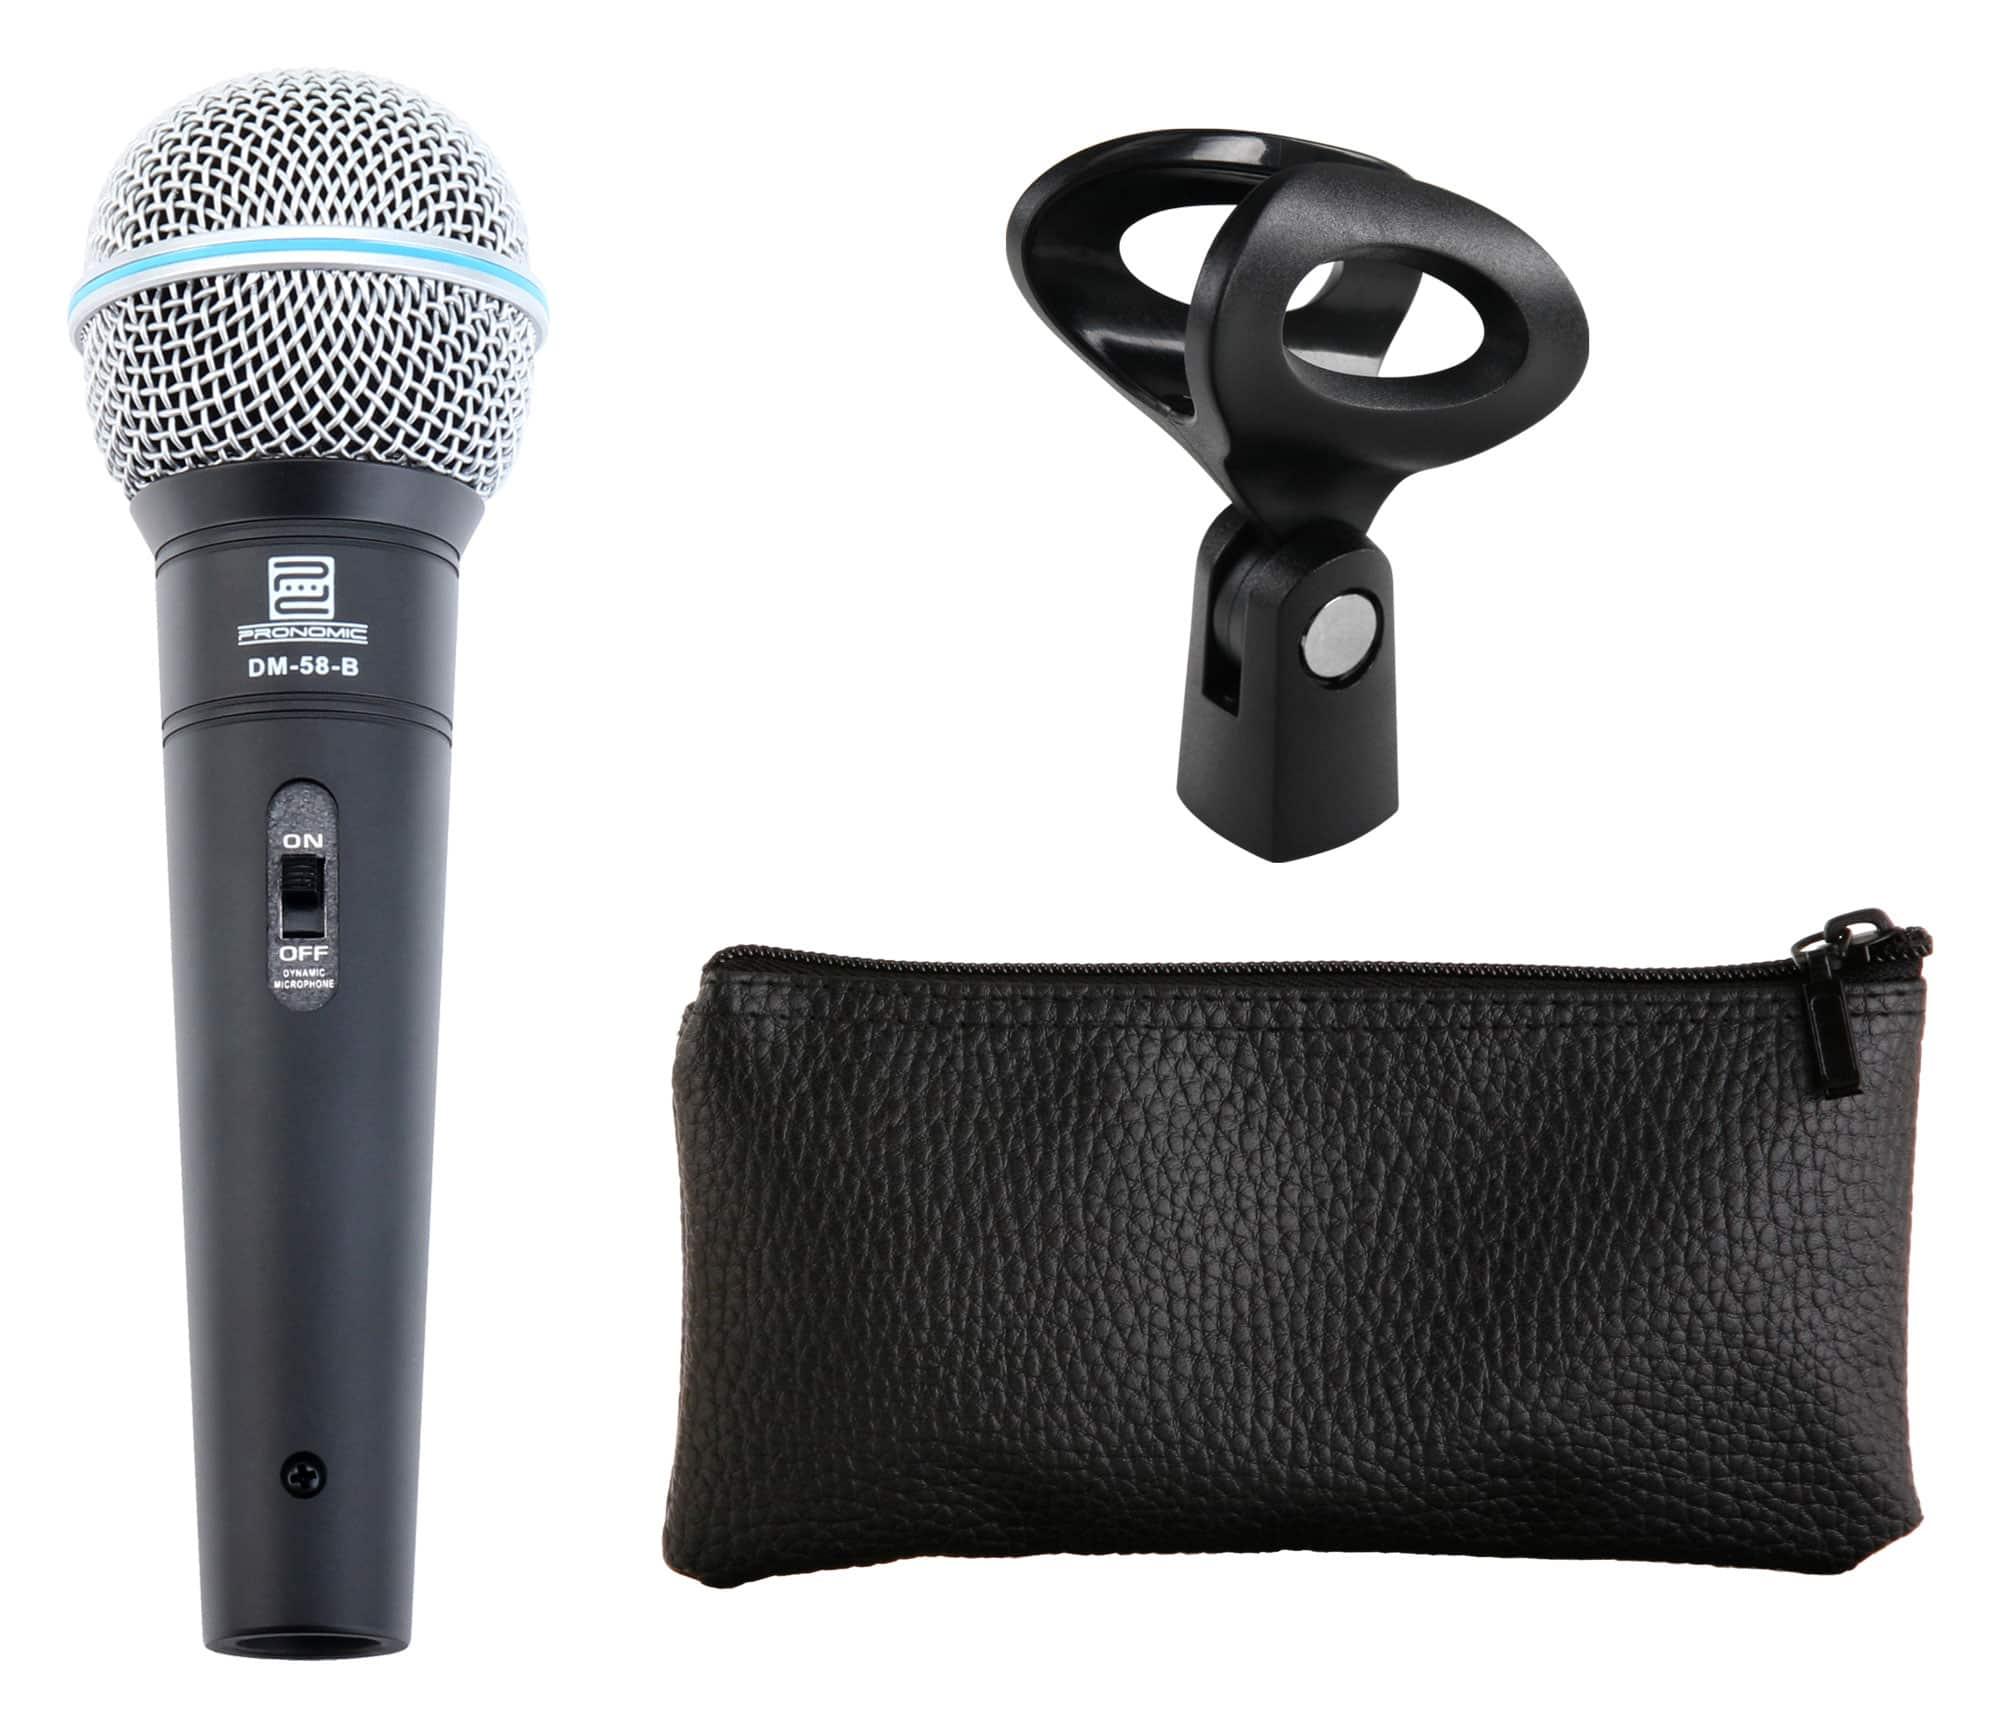 Pronomic DM-58-B Vocal Microphone Starter Set microphone, XLR cable ...